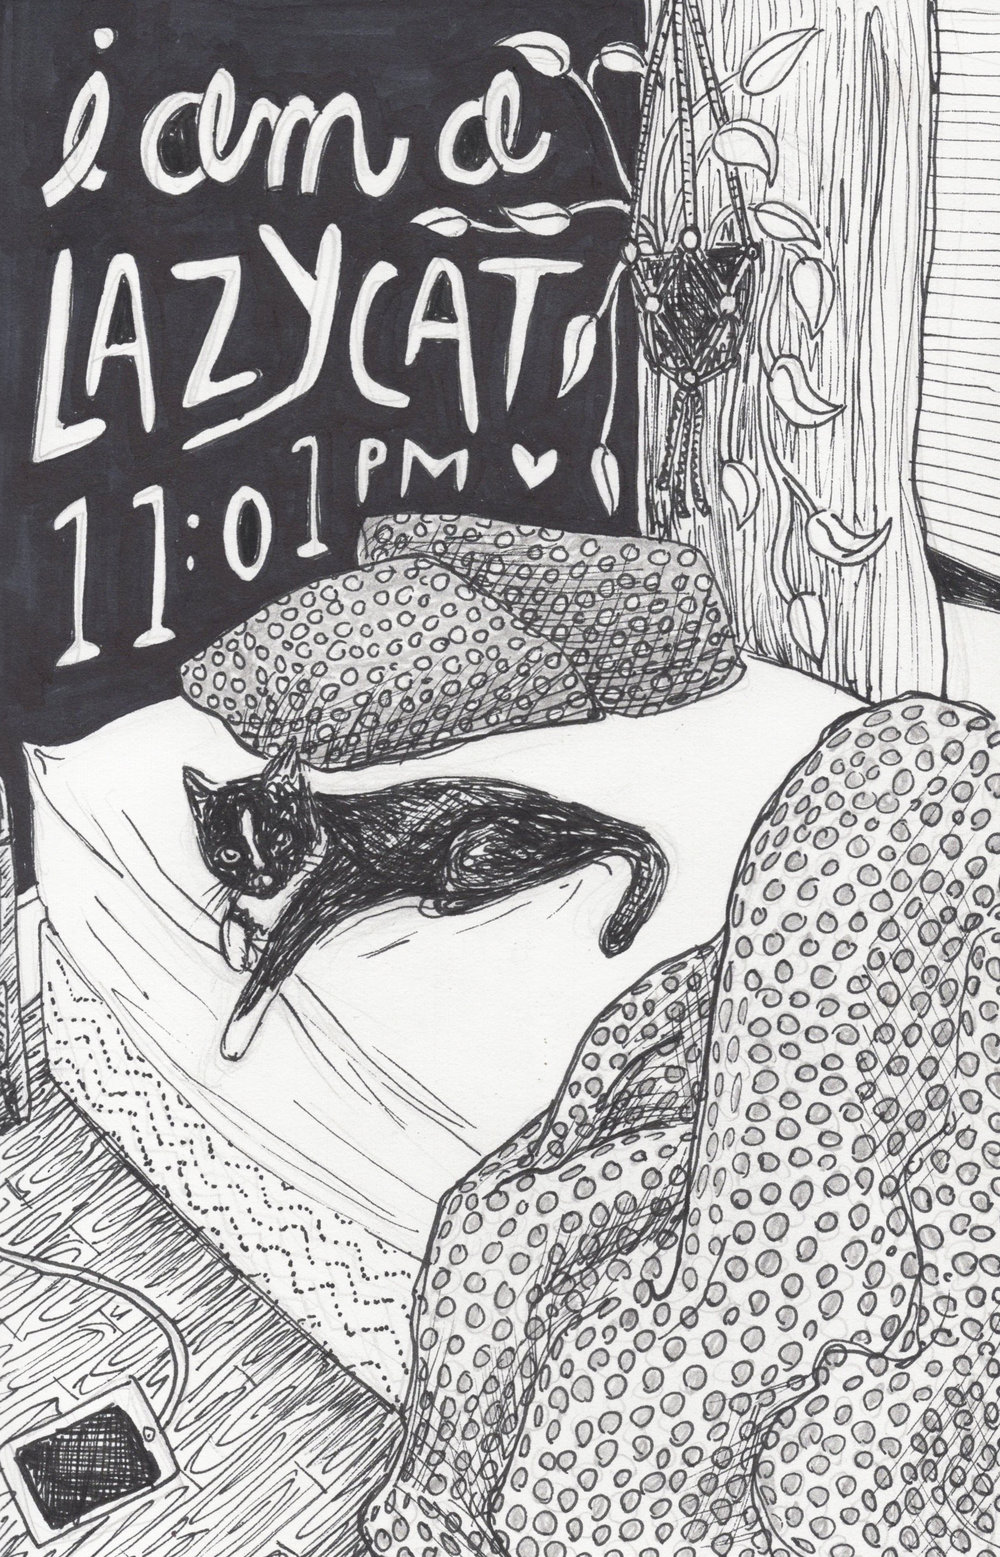 Lazy Cat.jpg